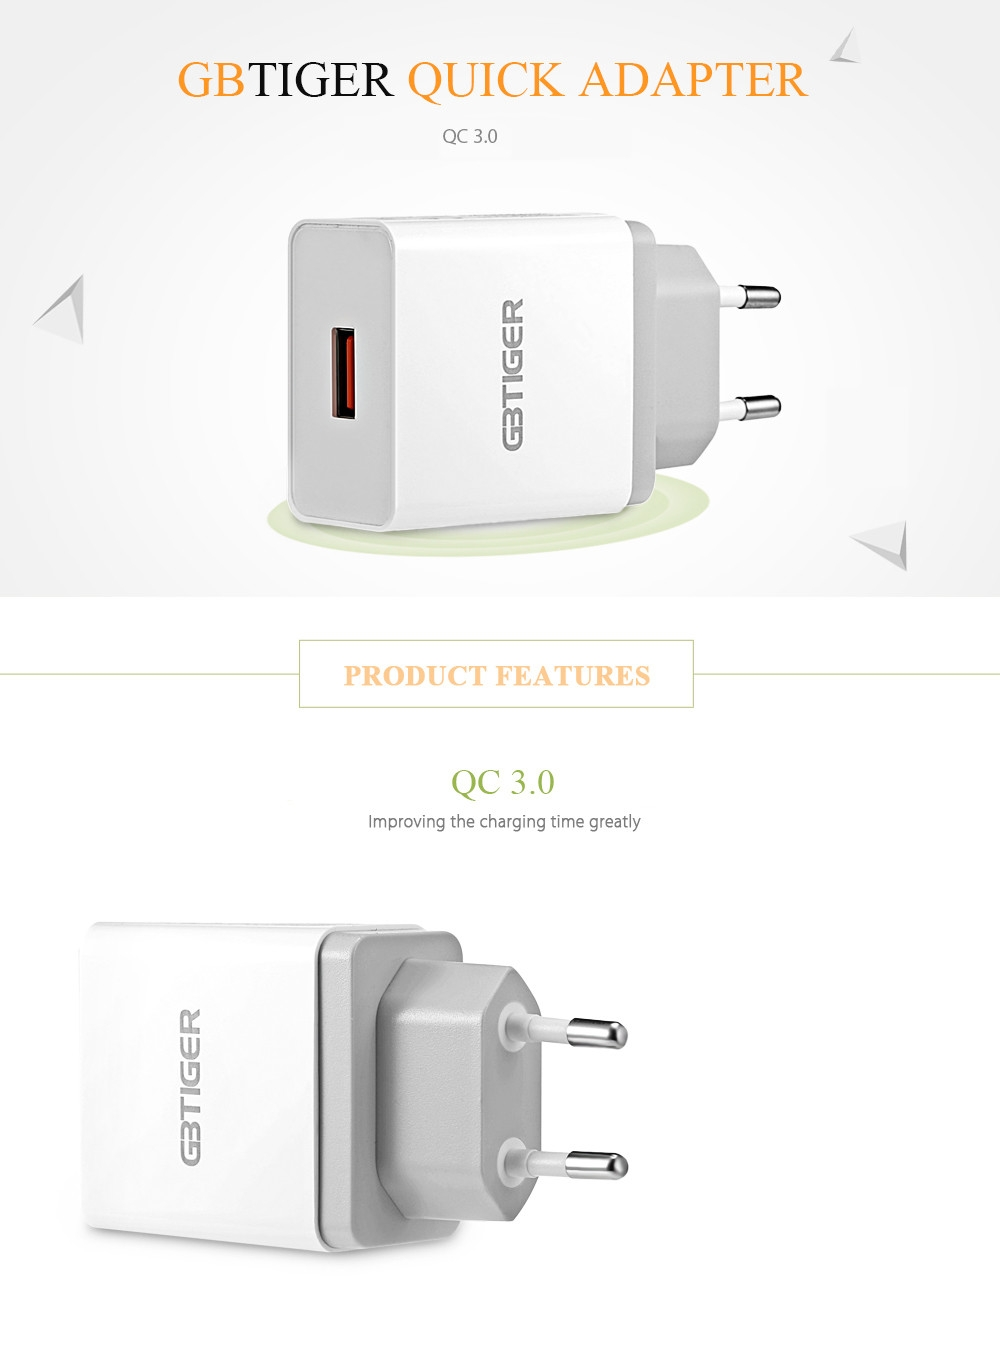 GBtiger Qualcomm Certification QC 3.0 Multifunctional Quick Travel Adapter